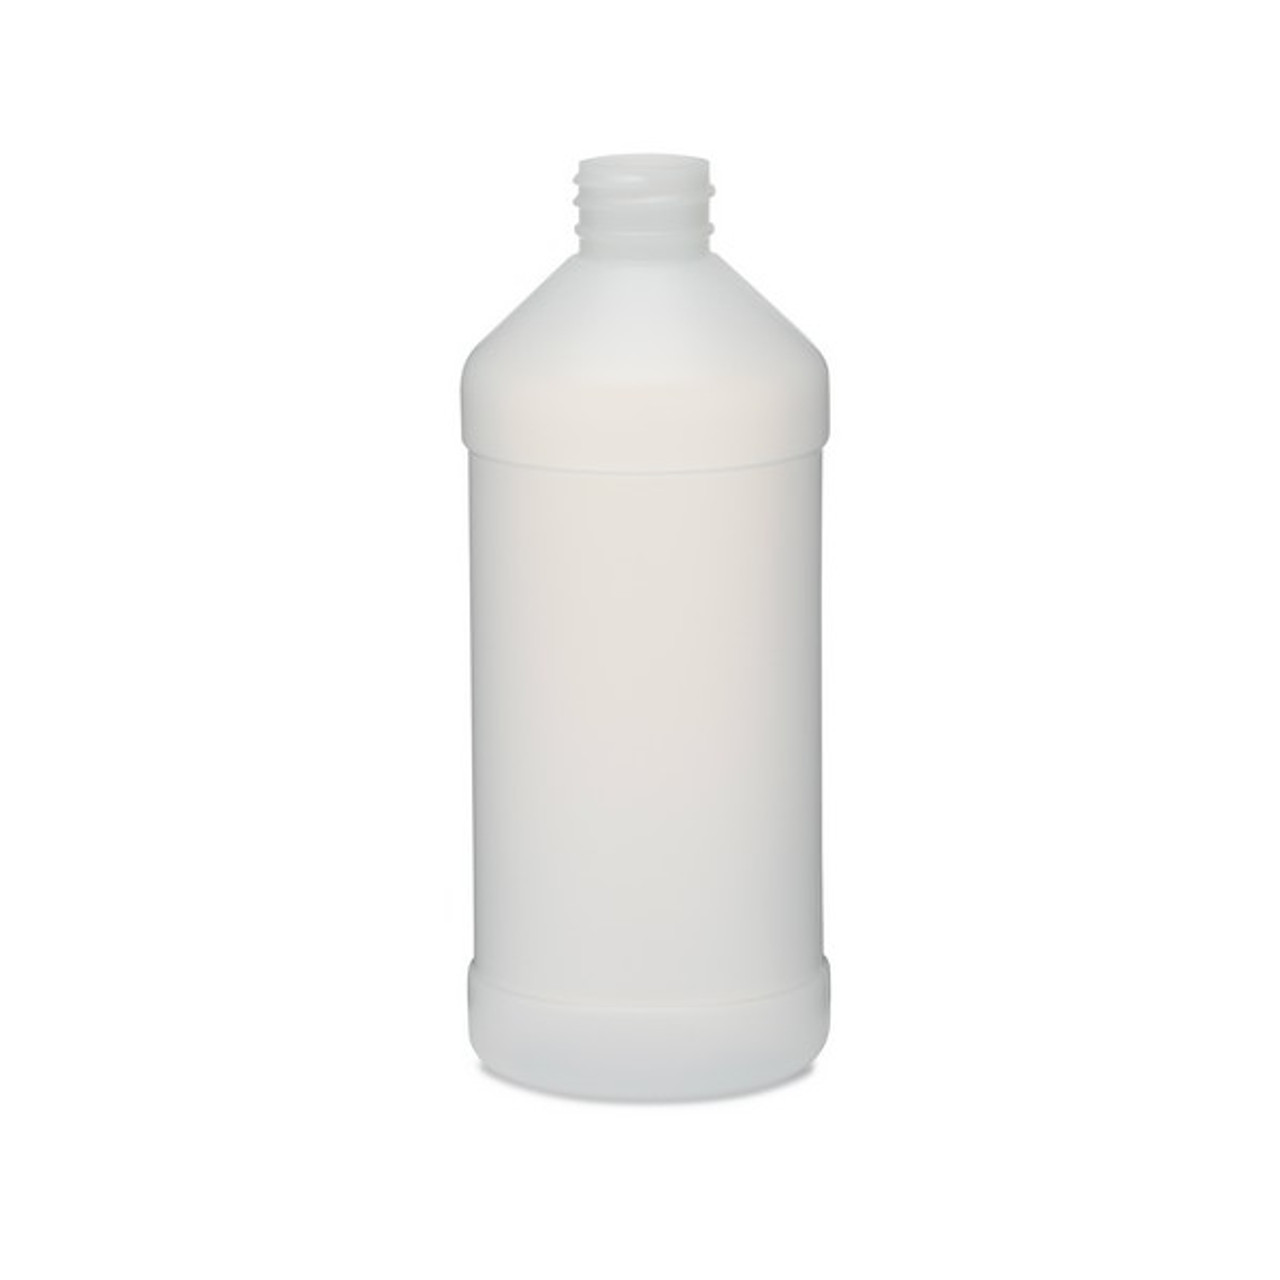 HDPE 16oz Squeeze Bottle with Plastic Cap